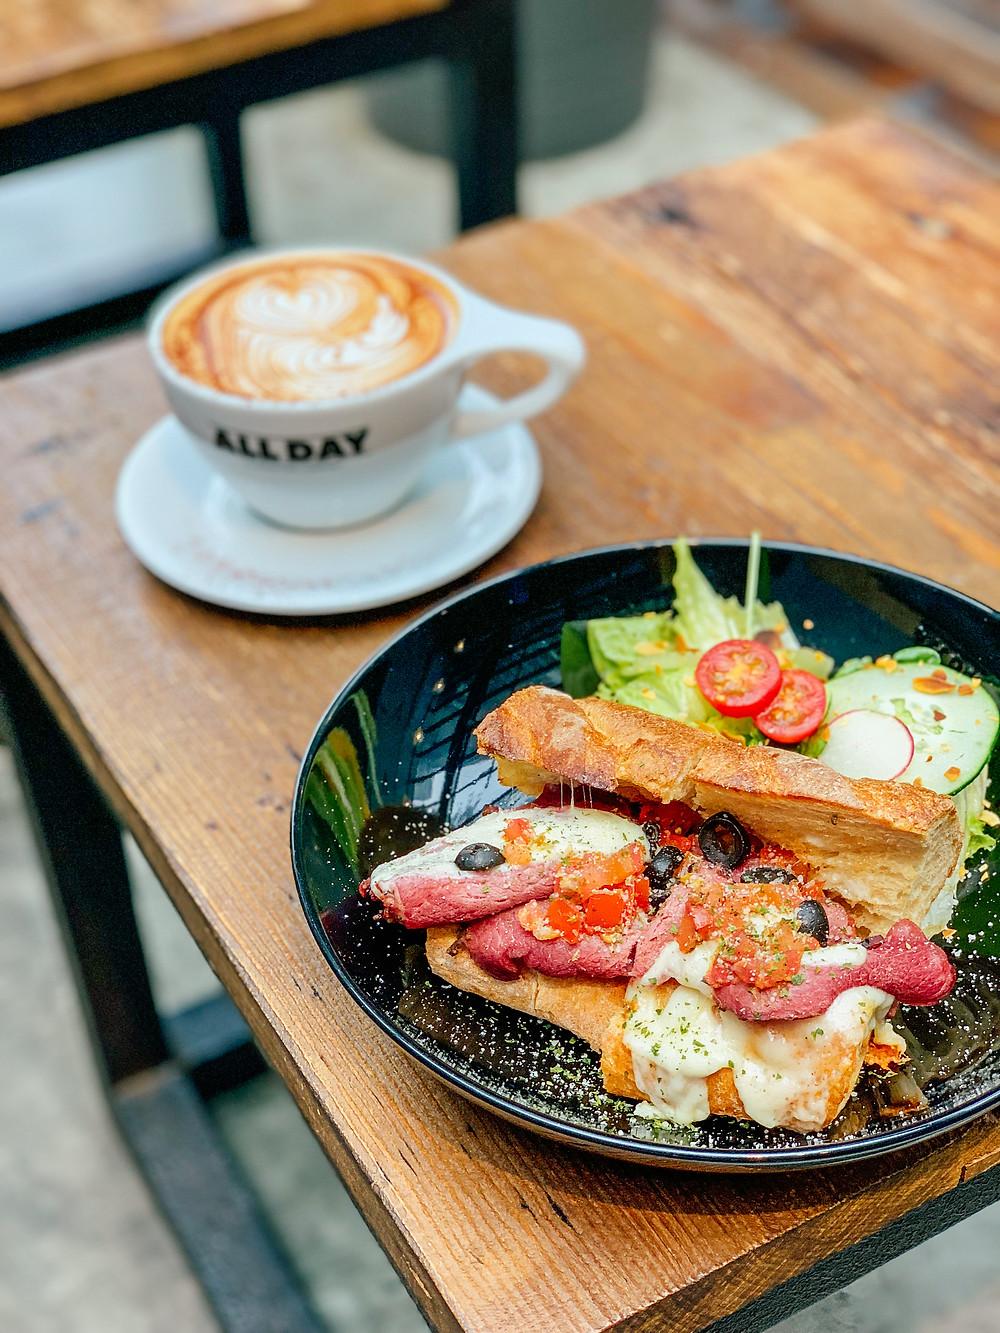 All Day Roasting Company l Taipei Coffee Shop l A Style Alike